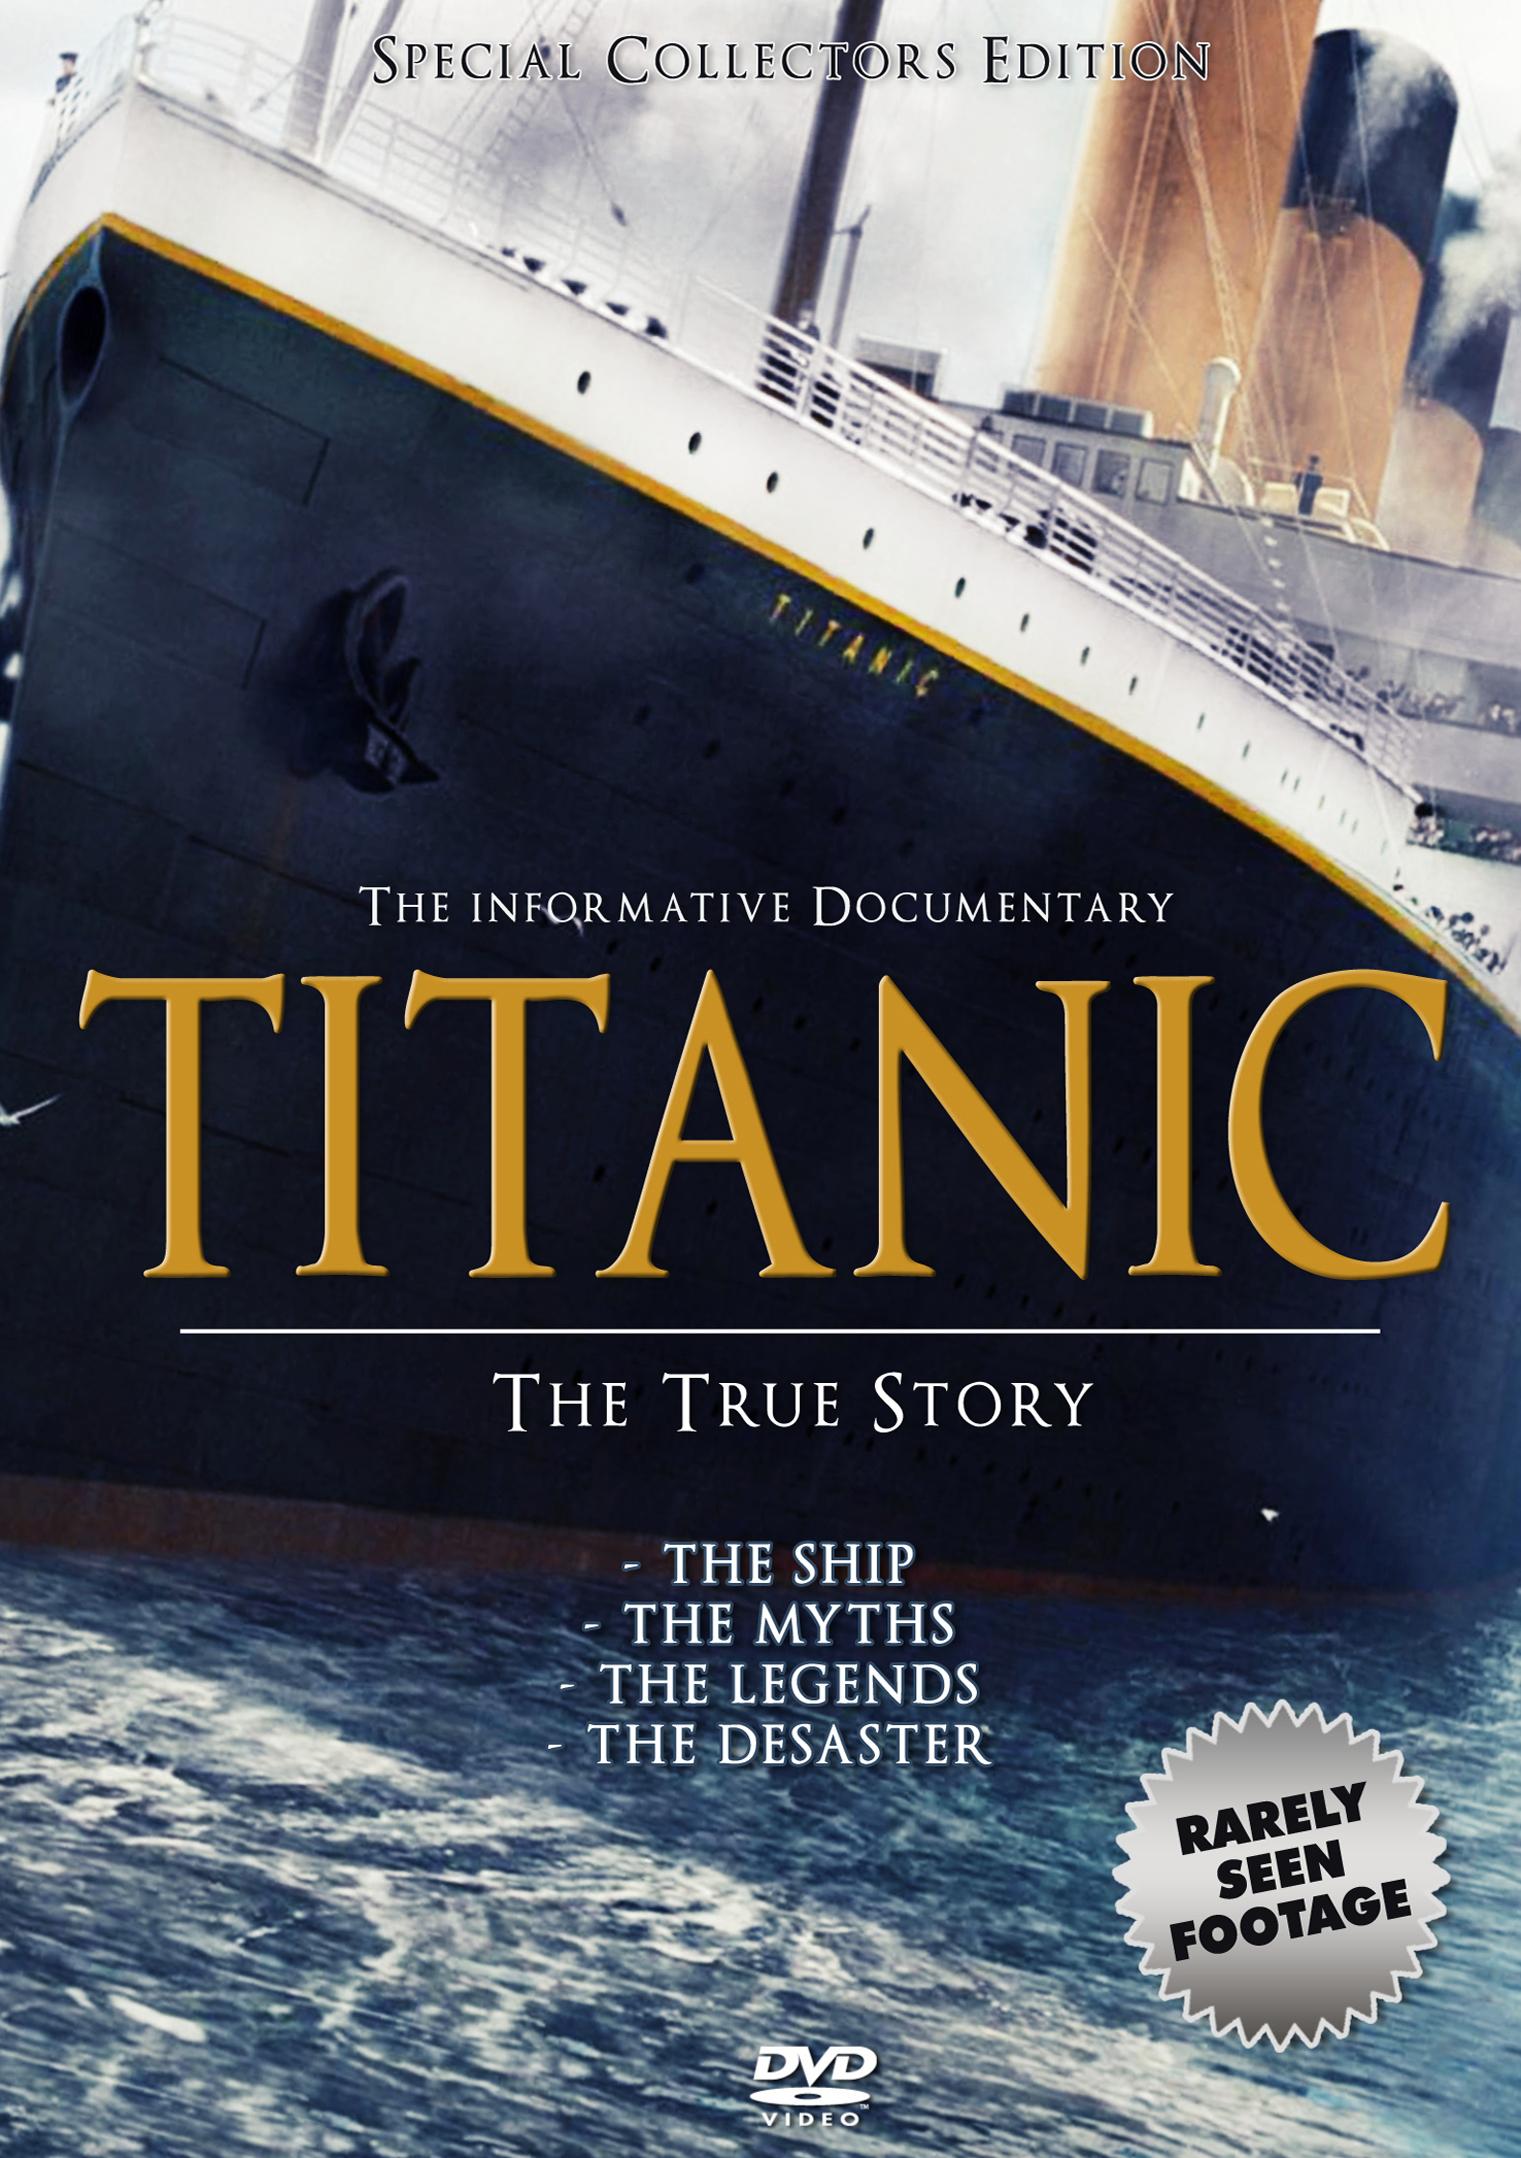 Titanic: The True Story